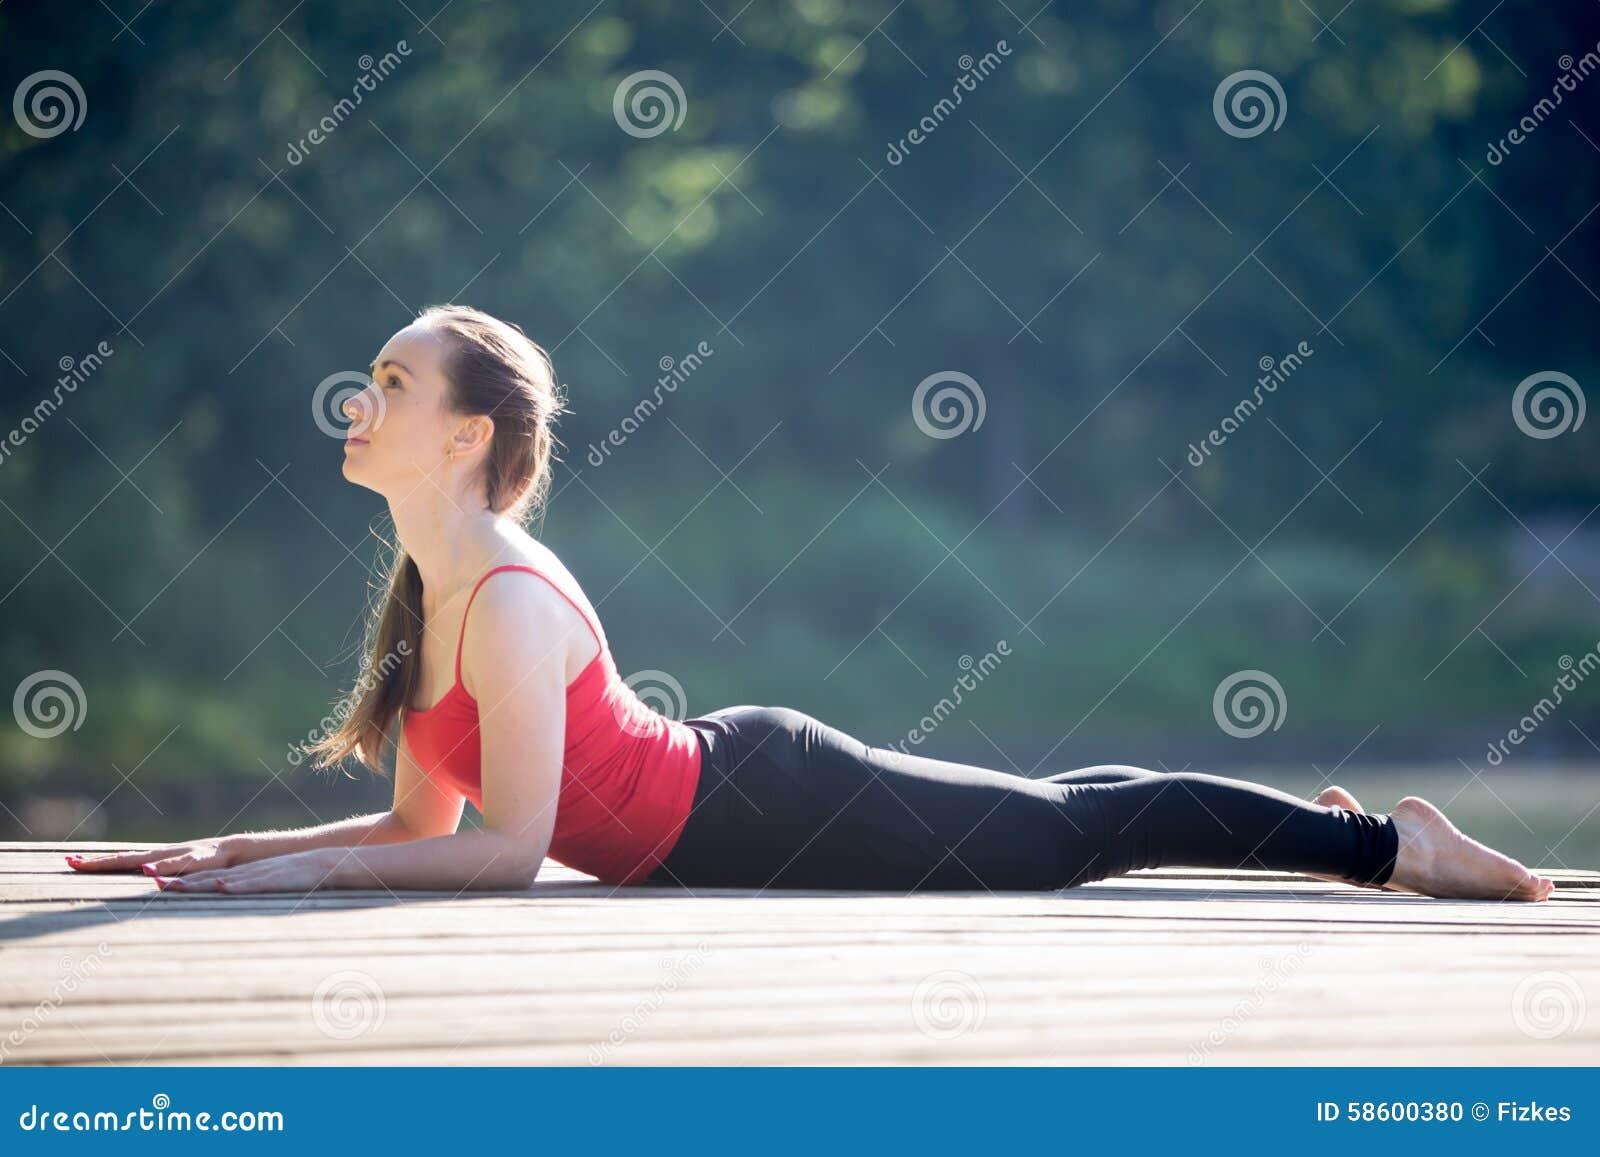 Download Teenage Girl In Sphinx Yoga Pose Stock Photo